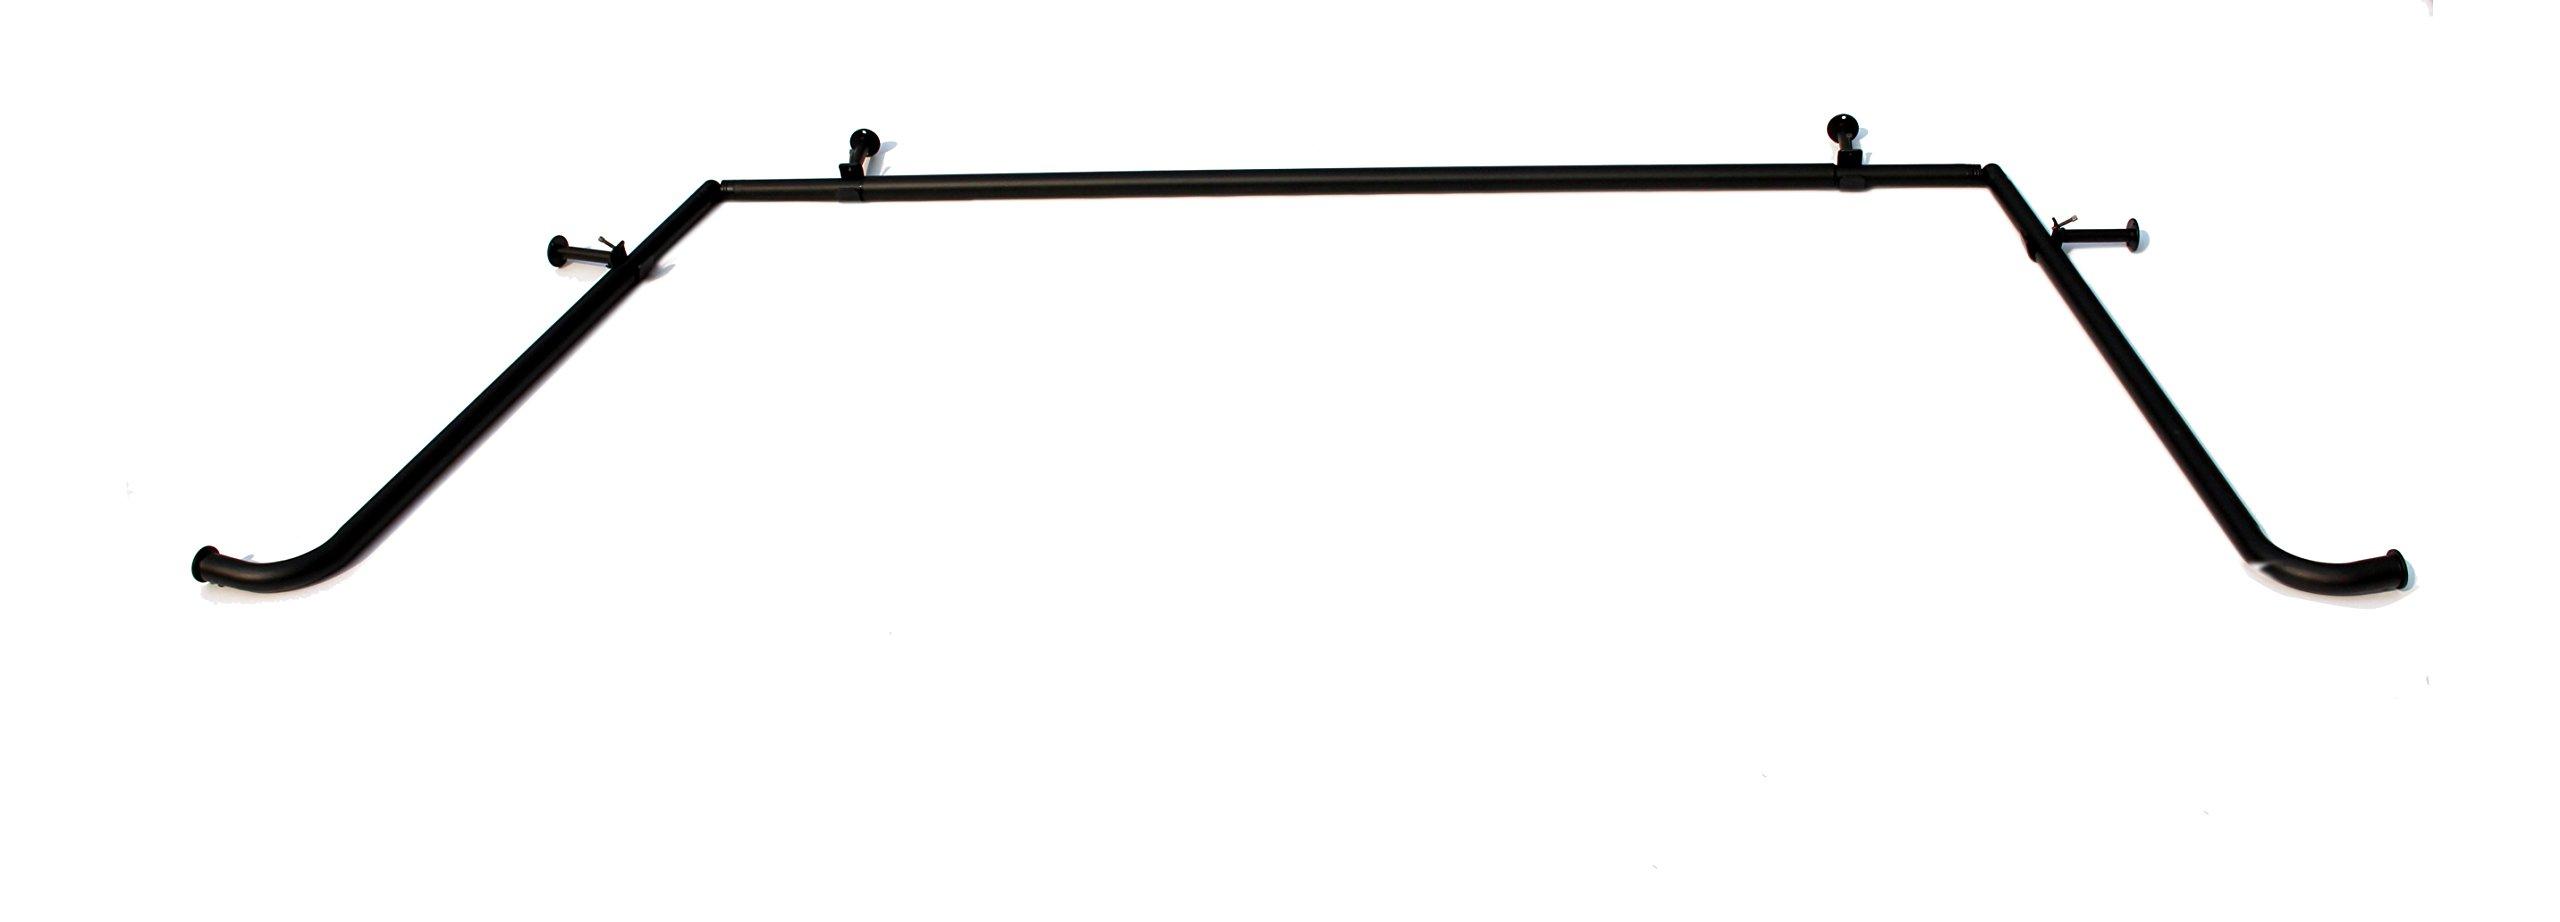 Urbanest Black Bay Window Curtain Rod Set, 1-inch by Urbanest (Image #3)